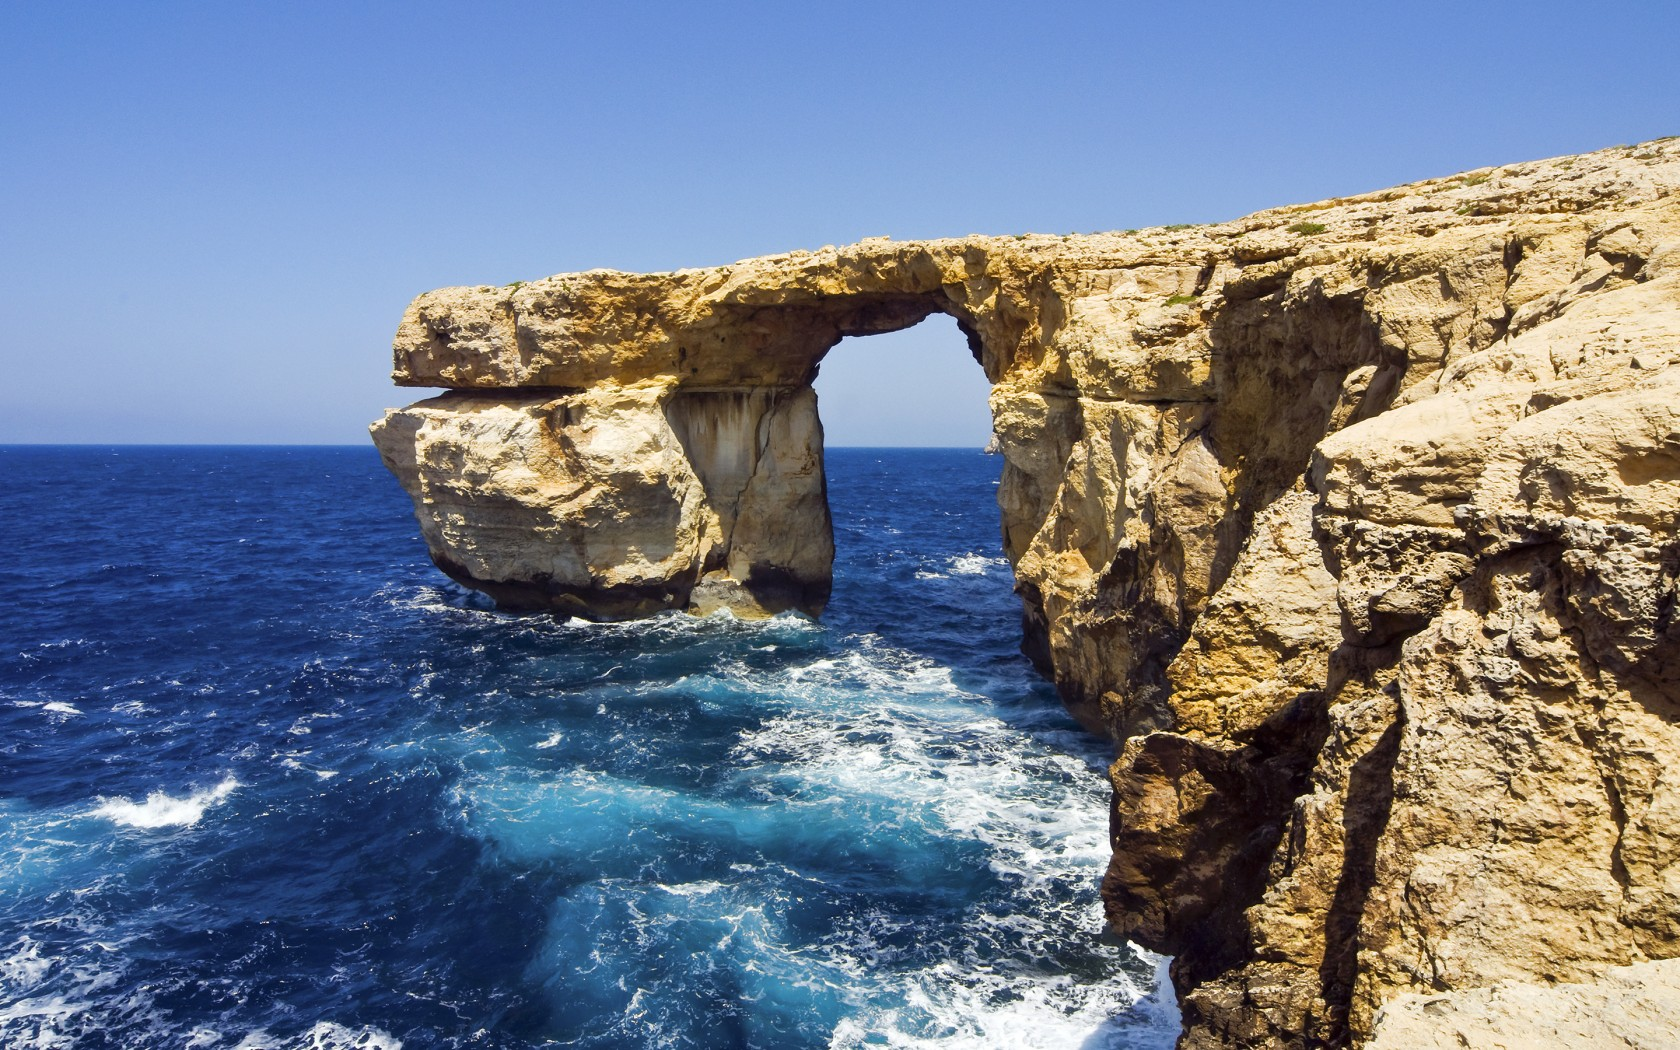 Game of Thrones Filming Location - Azure Window, Malta